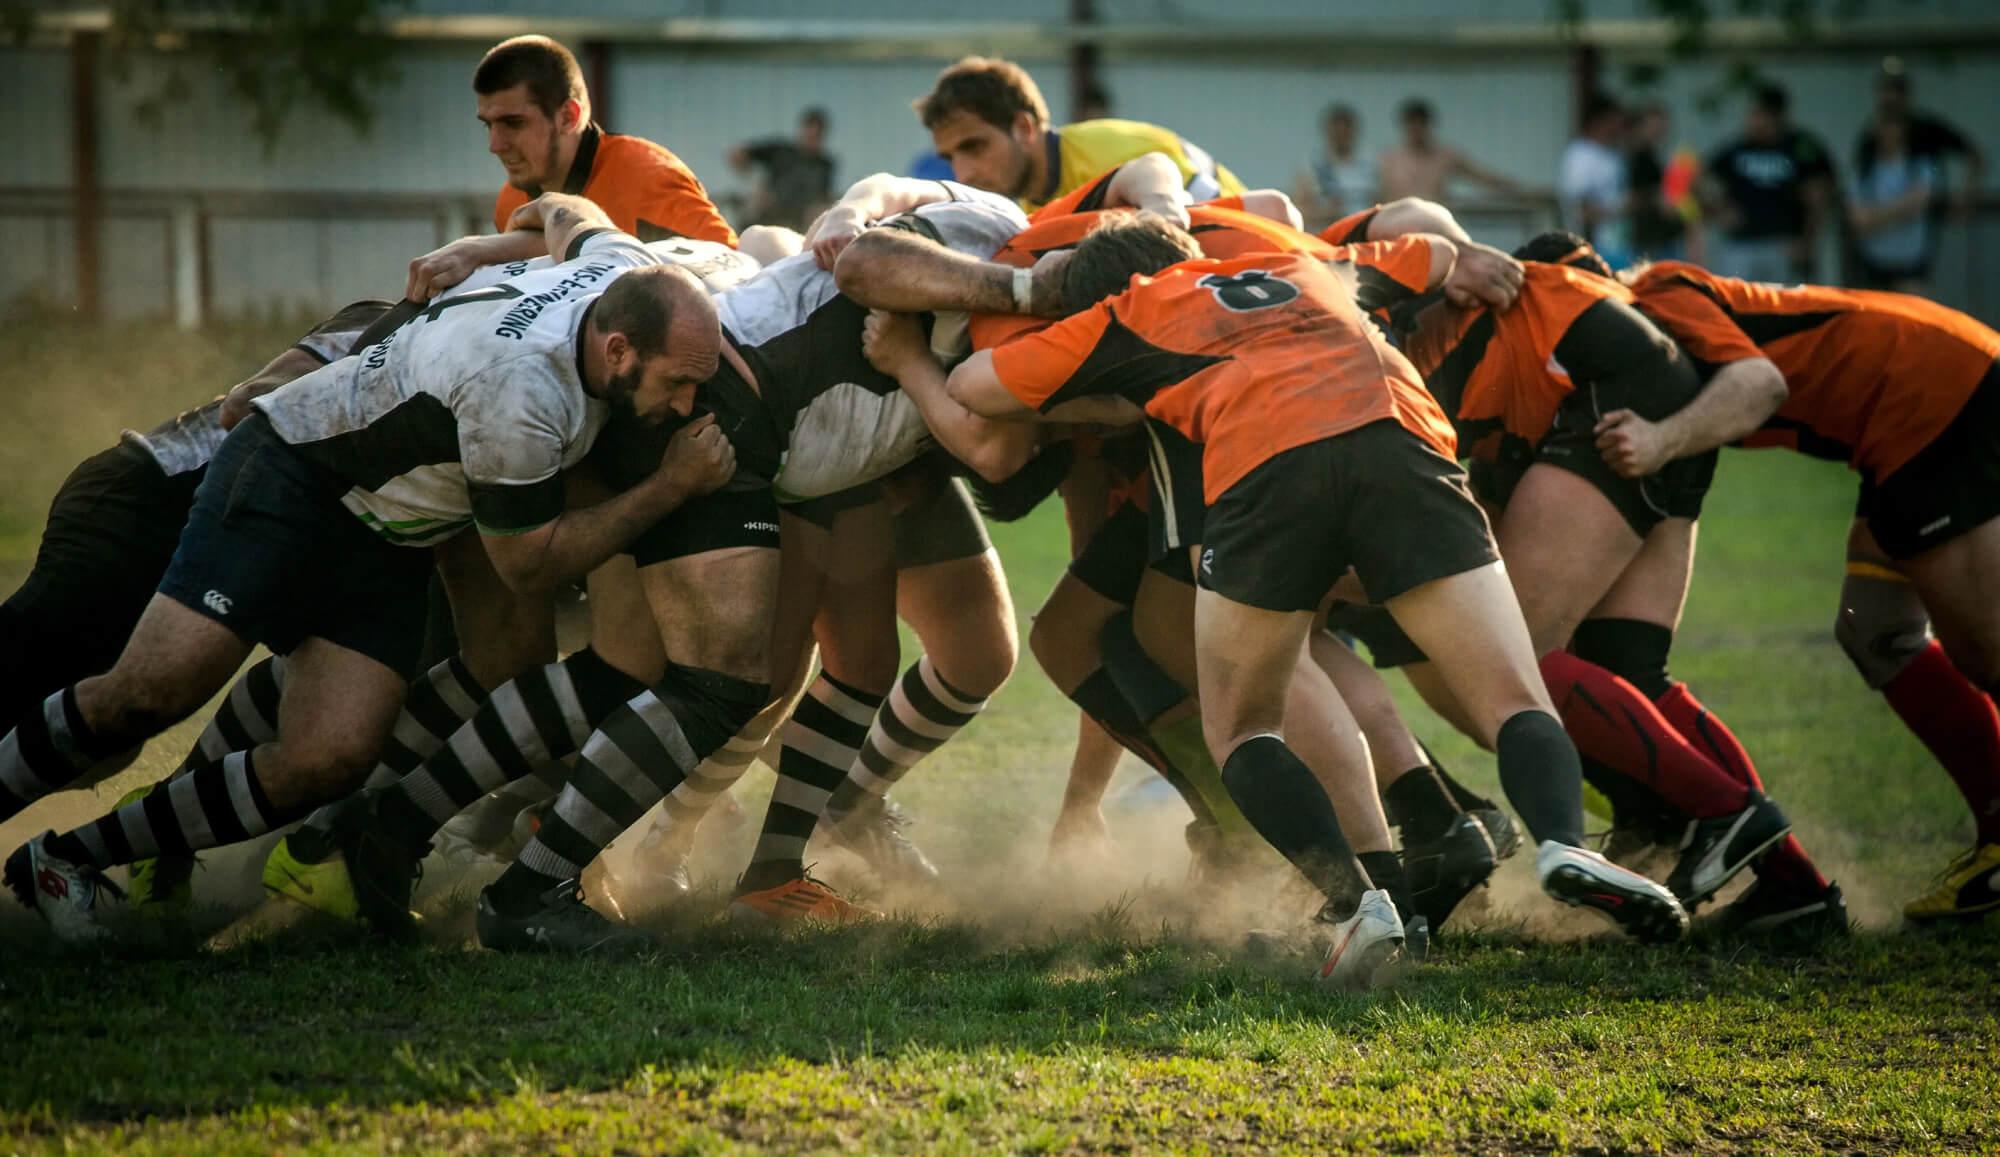 rugby - olga-guryanova-167262-unsplash.jpg